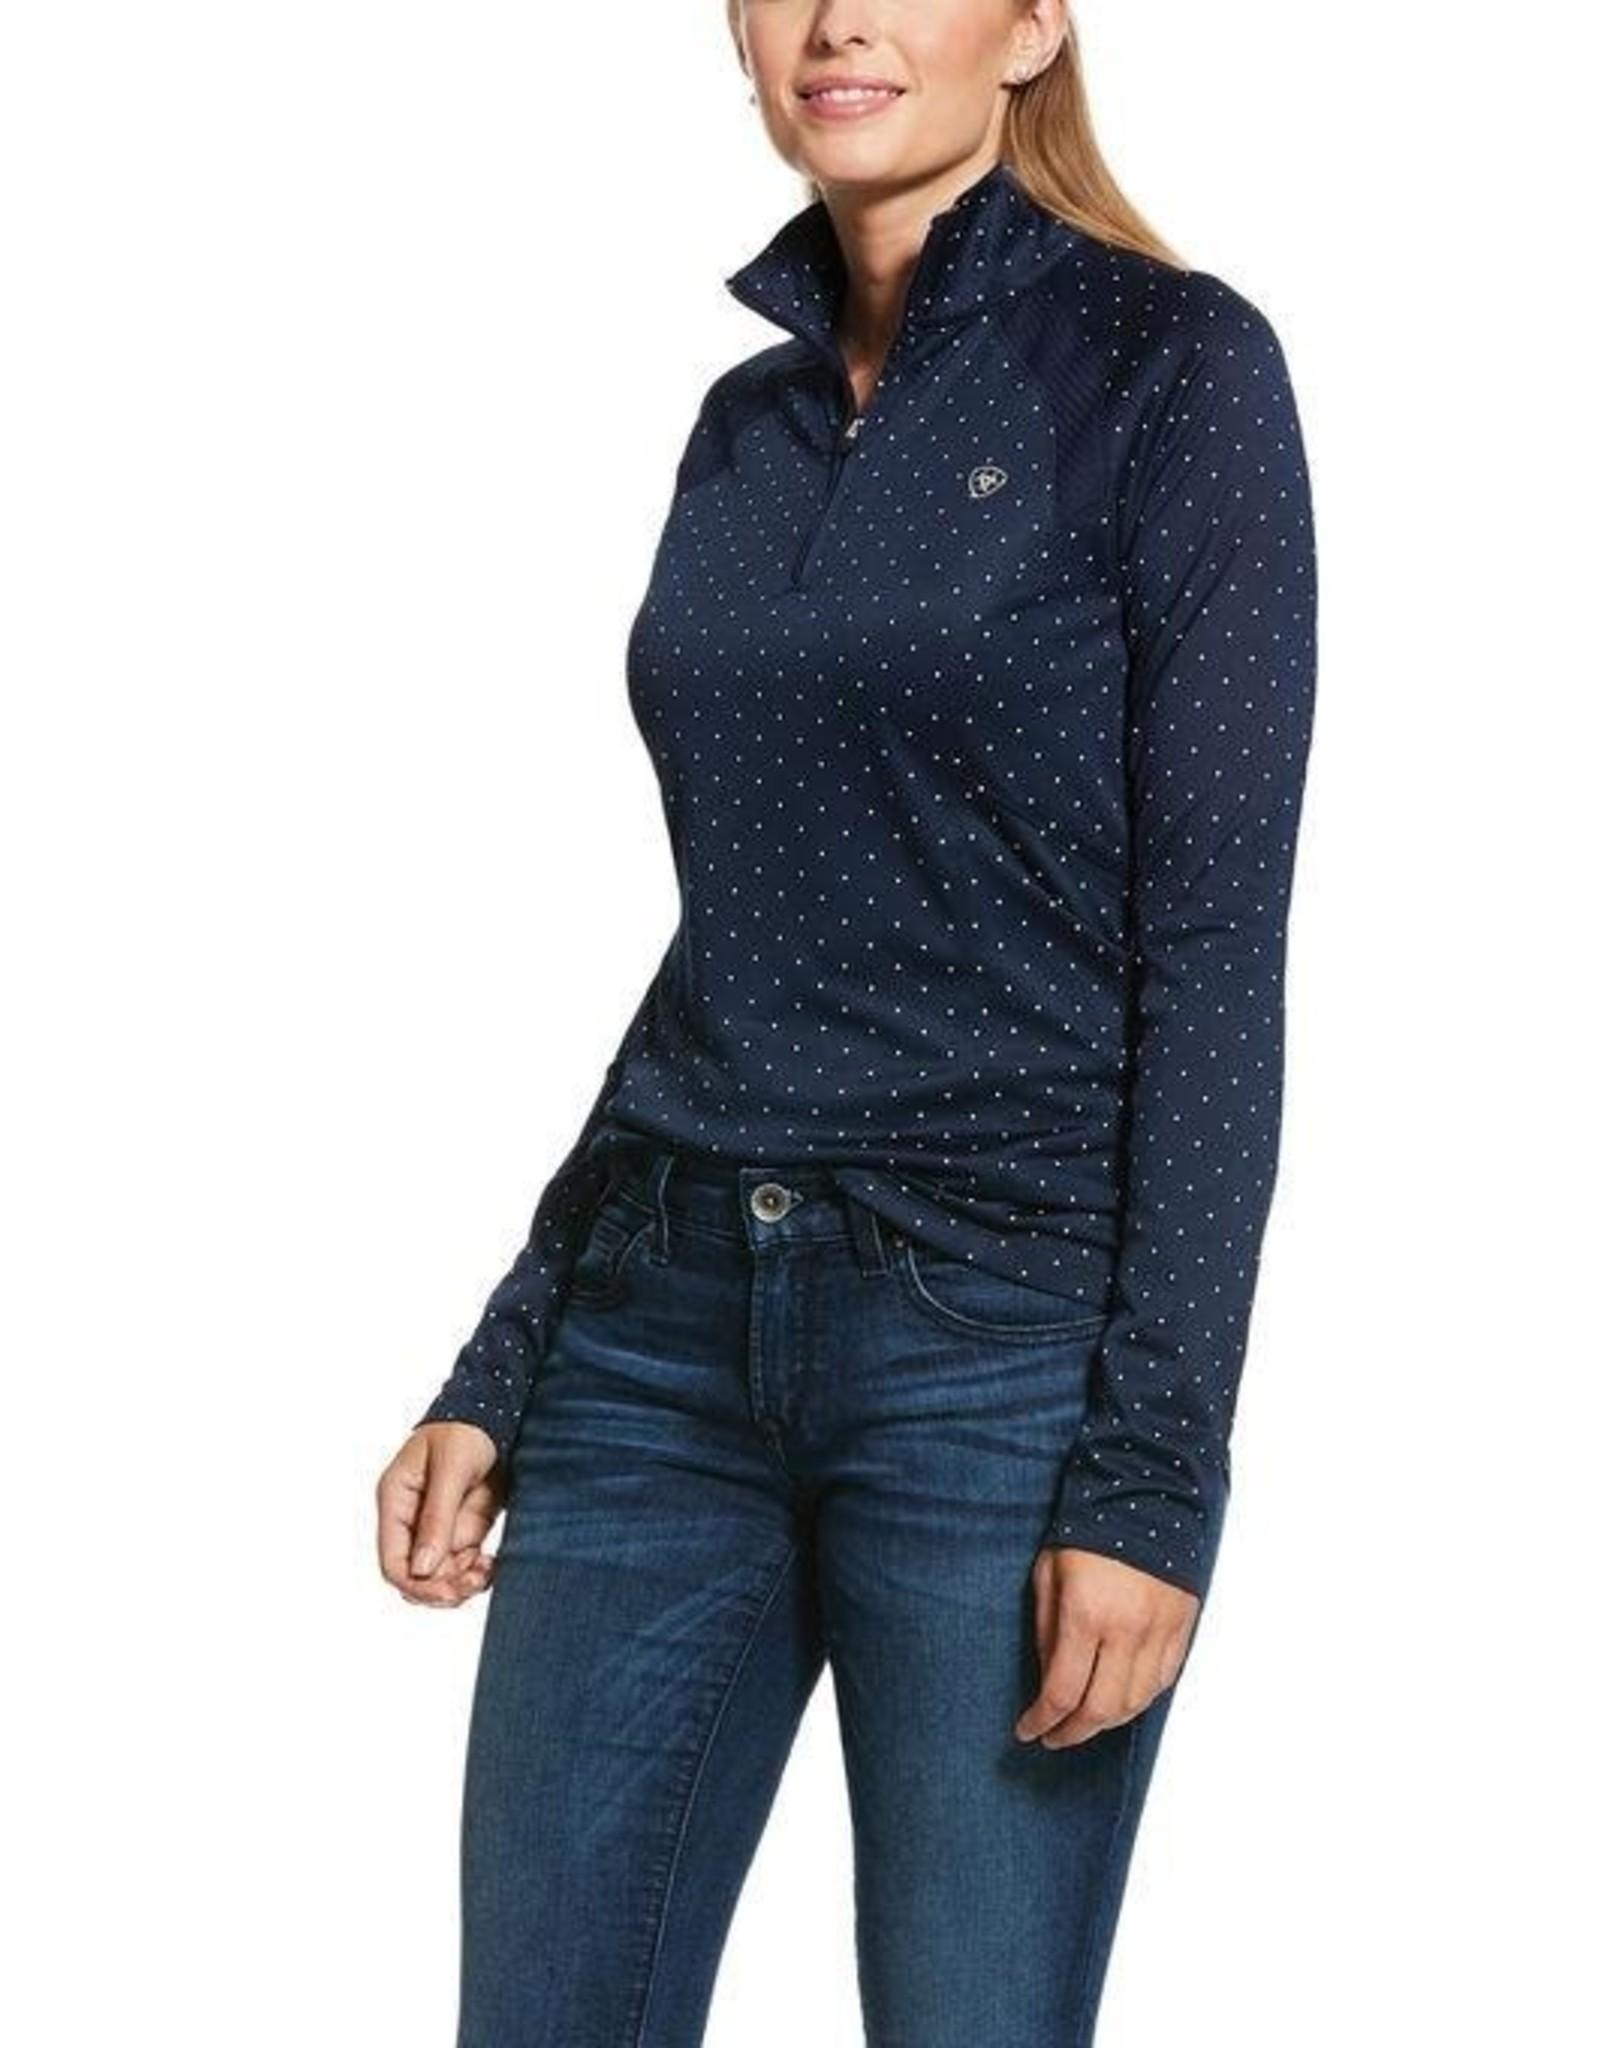 Ariat Ladies' Sunstopper 2.0 1/4 Zip Baselayer Shirt